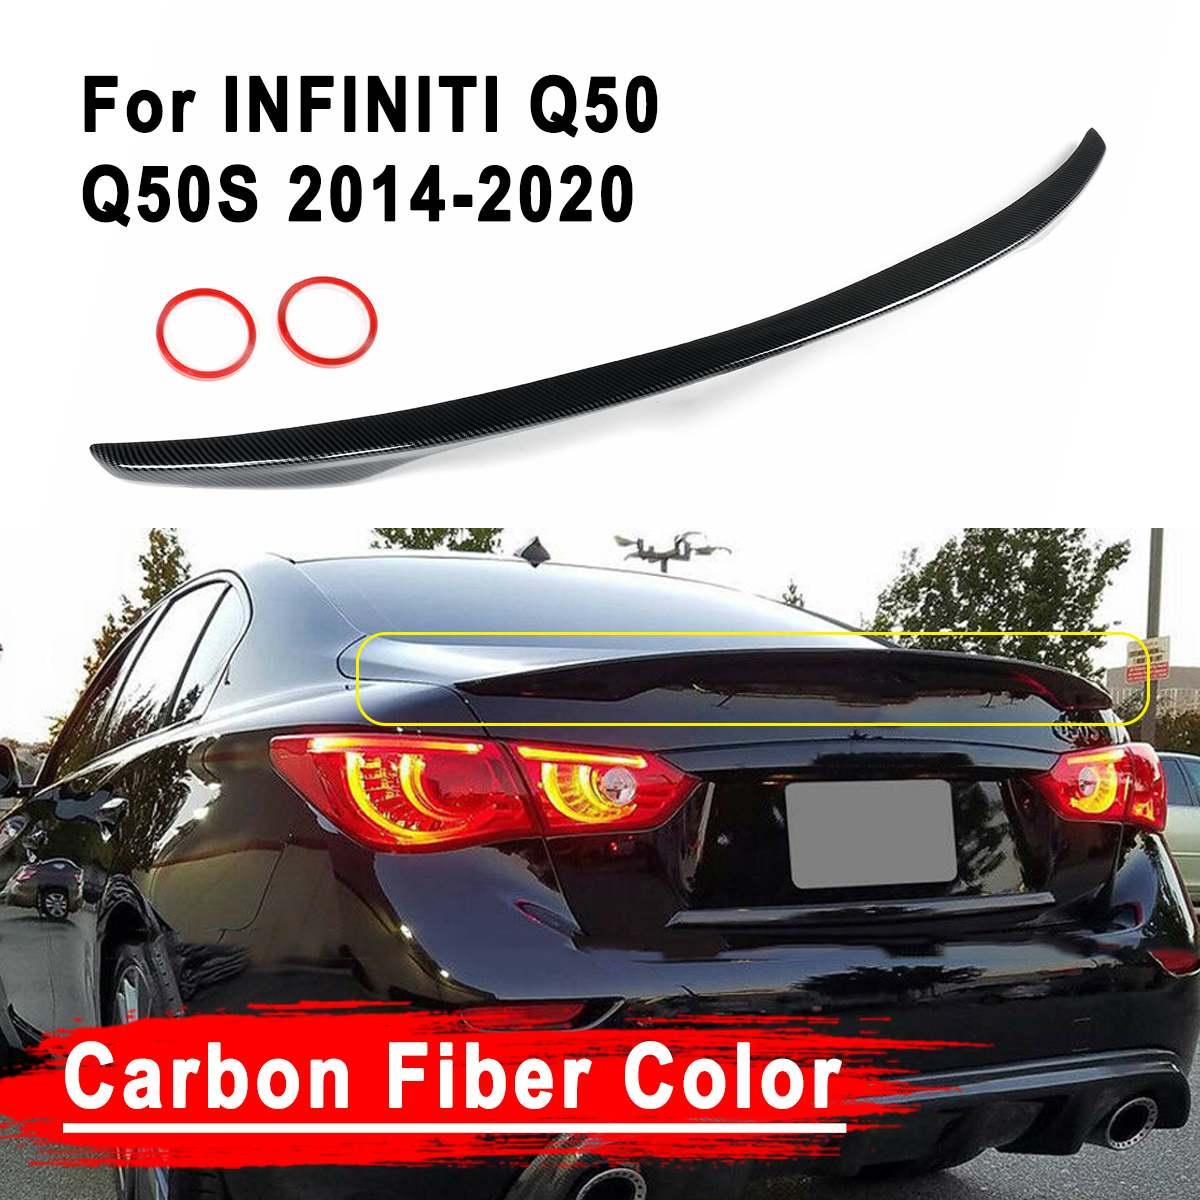 Ala pintada de fibra de carbono Color ABS alerón de la tapa del maletero para INFINITI Q50 2014-2020 para Jdm VIP